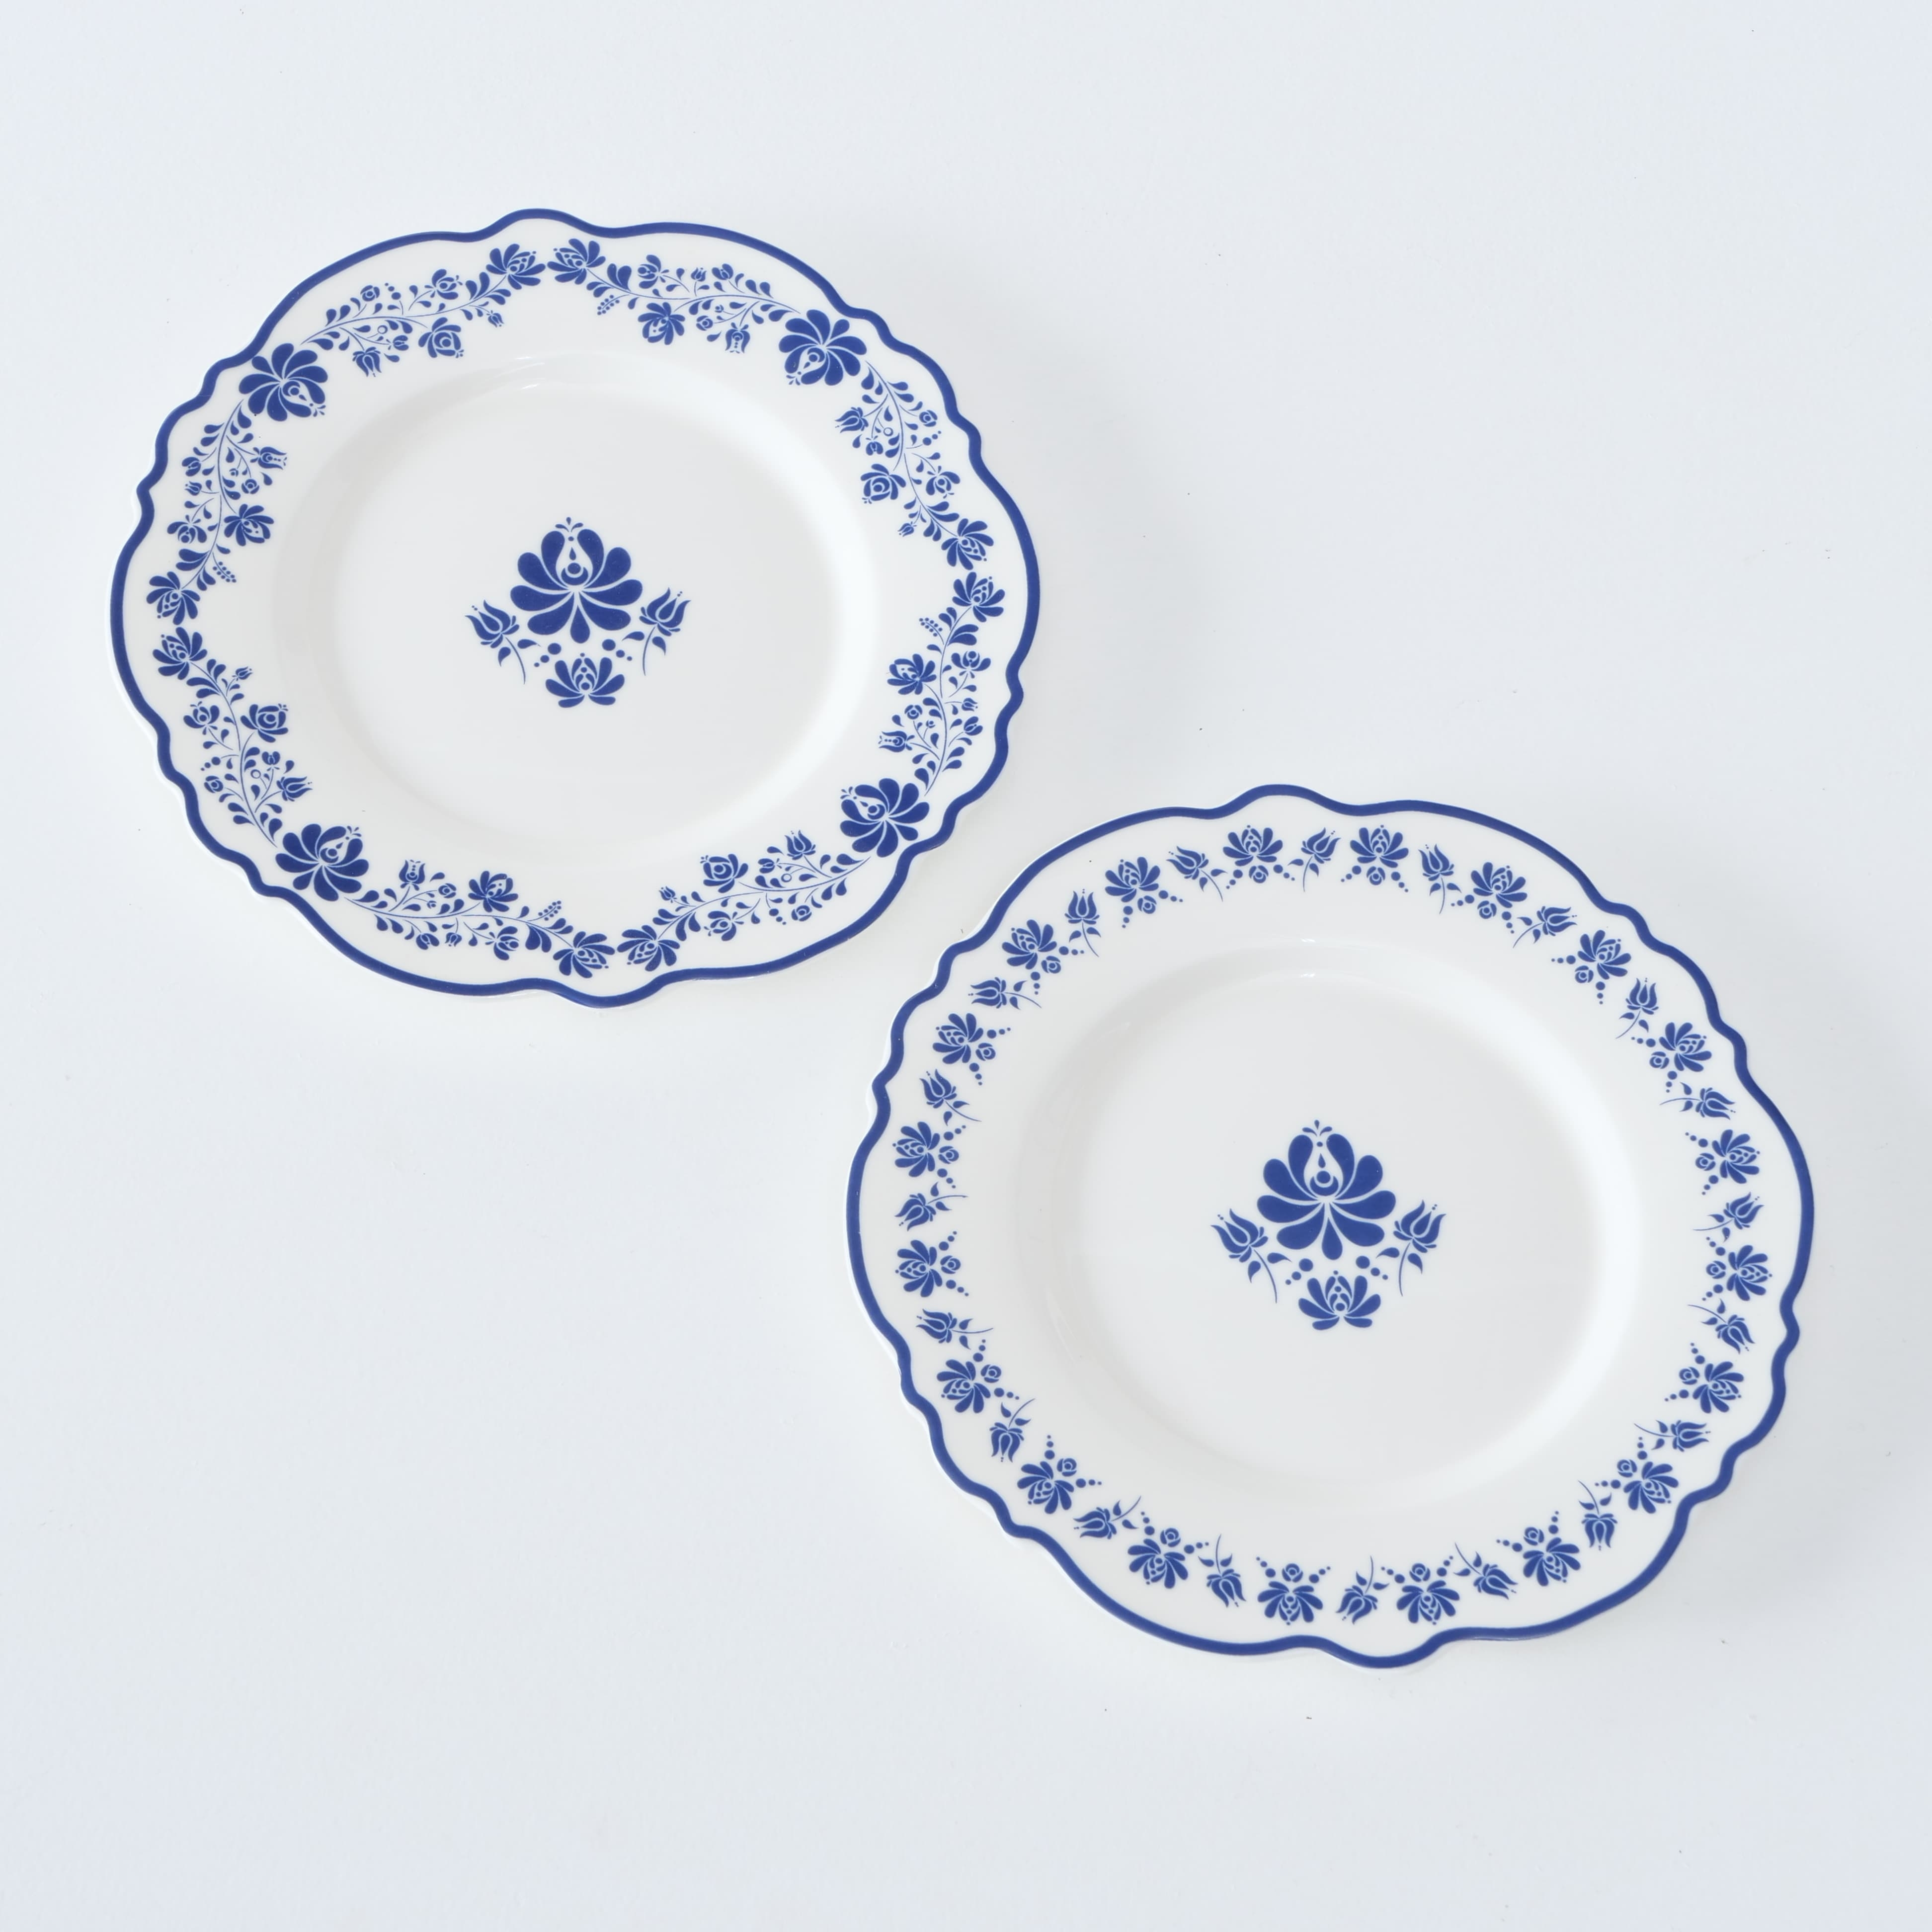 Farfurie intinsa din ceramica Megan Alb / Albastru, Modele Asortate, 19 cm imagine